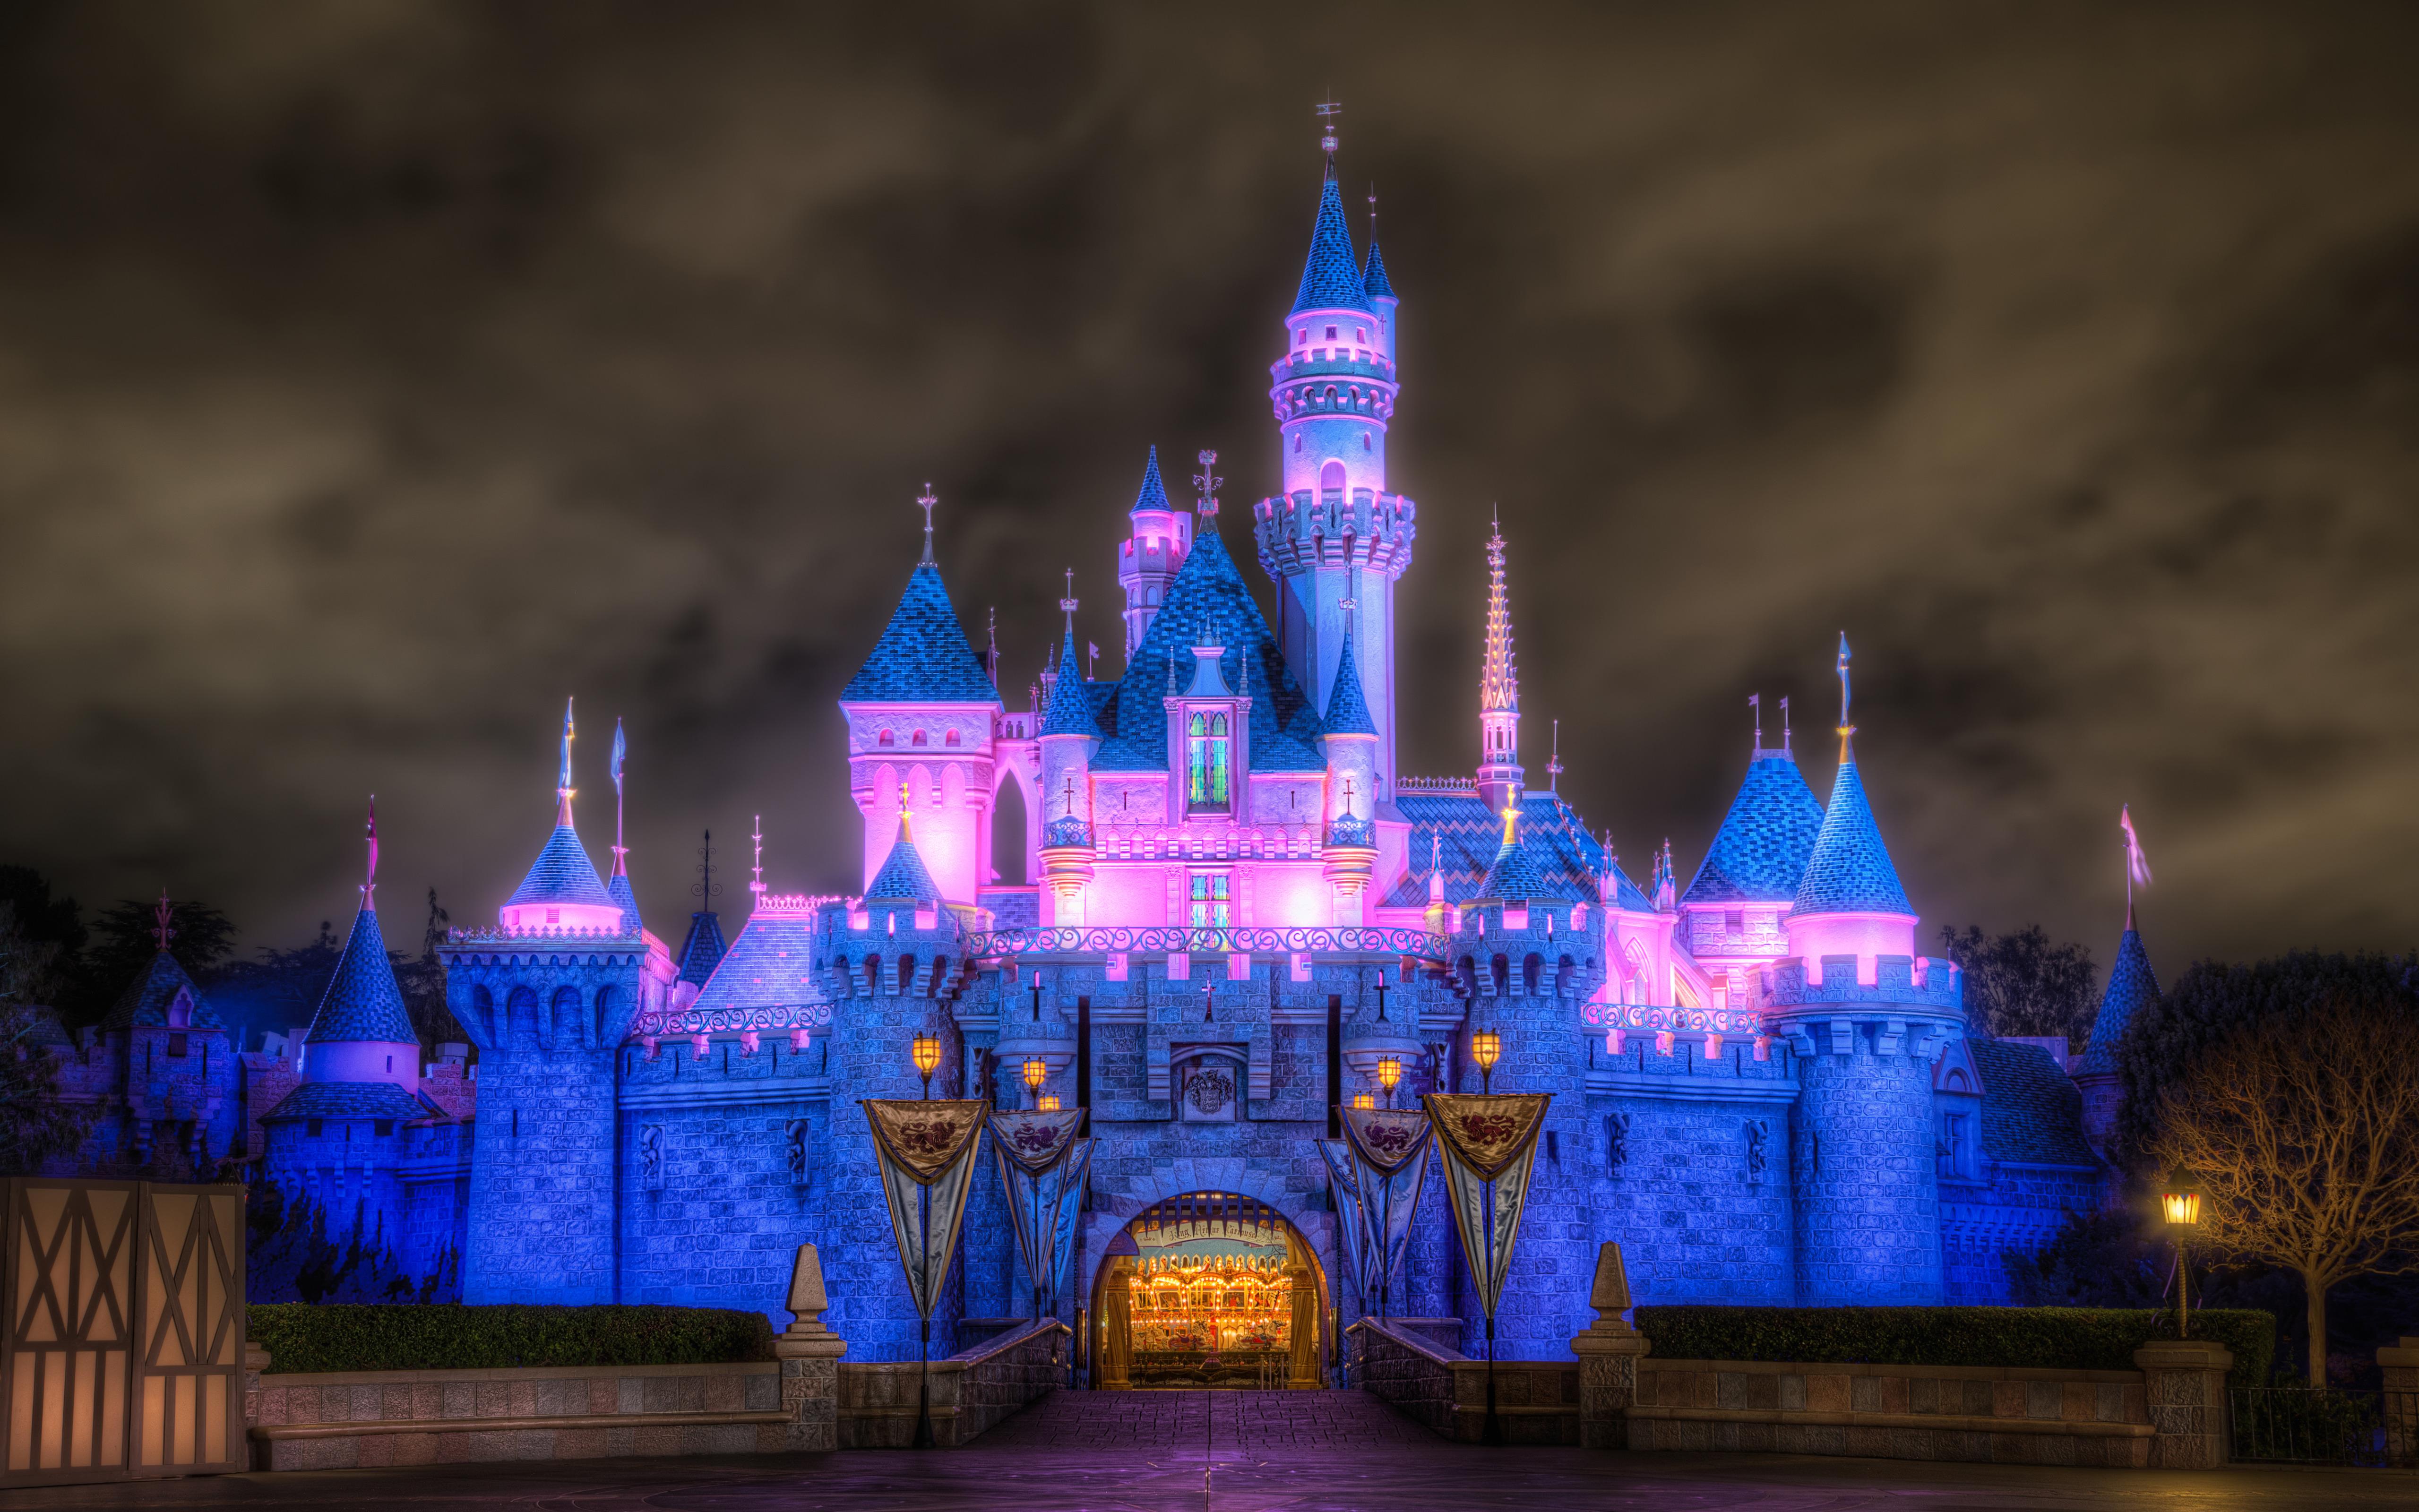 Free Download Download Sleeping Beauty Castle At Night Disneyland Wallpaper 5119x3200 For Your Desktop Mobile Tablet Explore 73 Disneyland Wallpaper Disney World Wallpaper Free Disney Desktop Wallpaper Background Disney